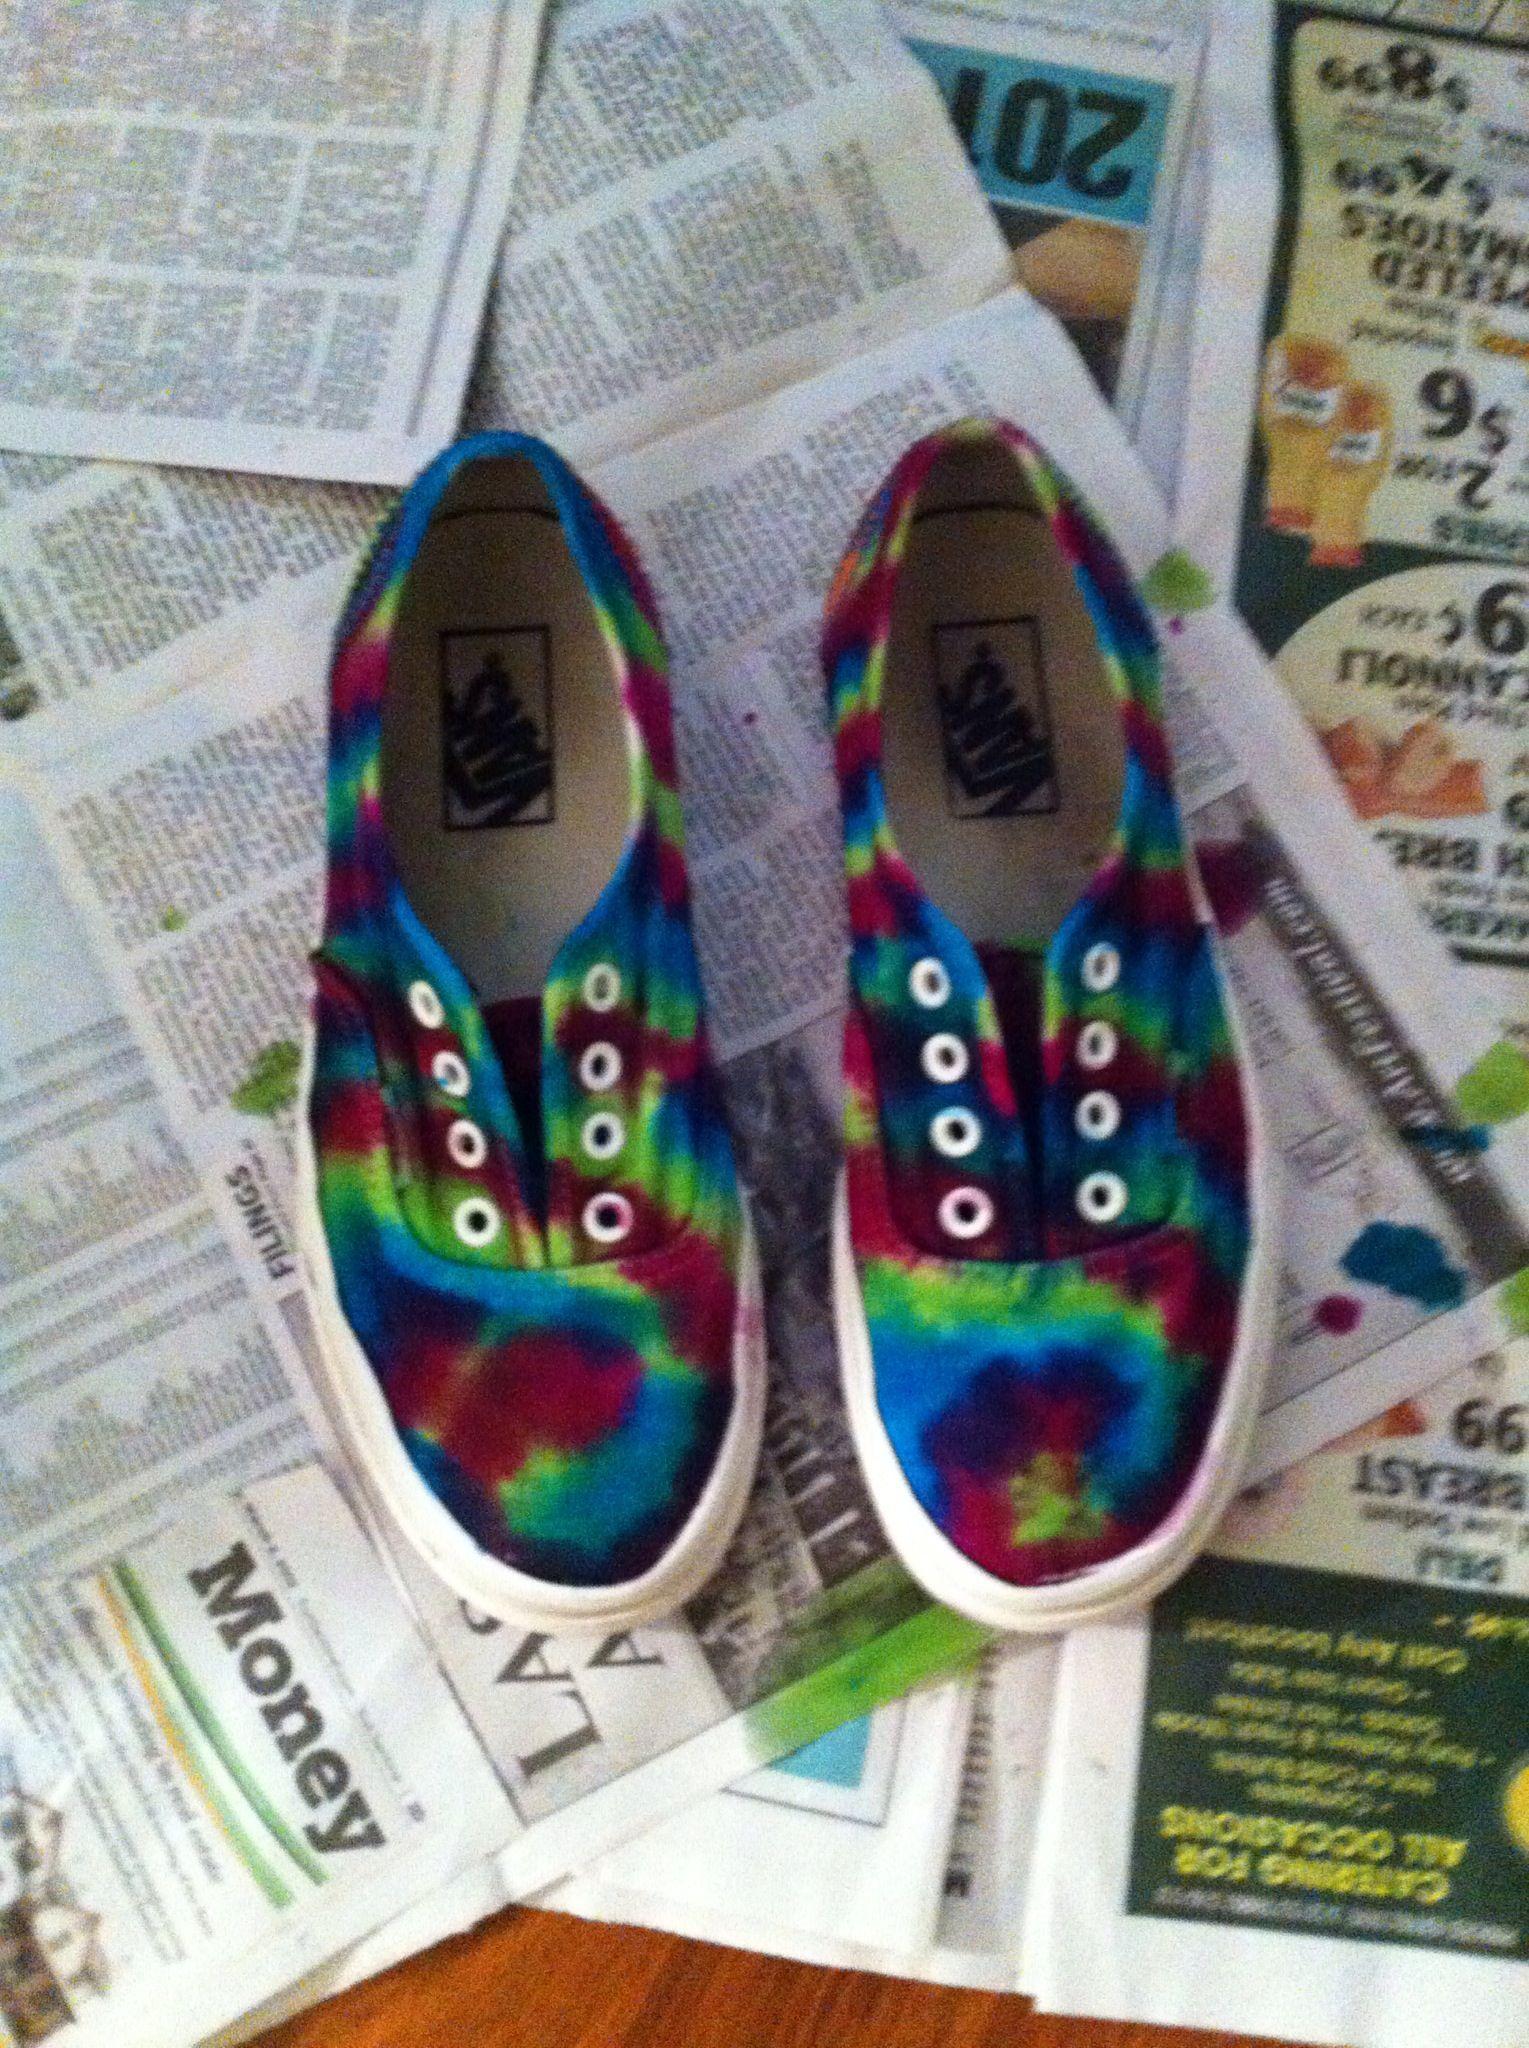 eba1c6be13aa26 How to Make Tie Dye Sneakers